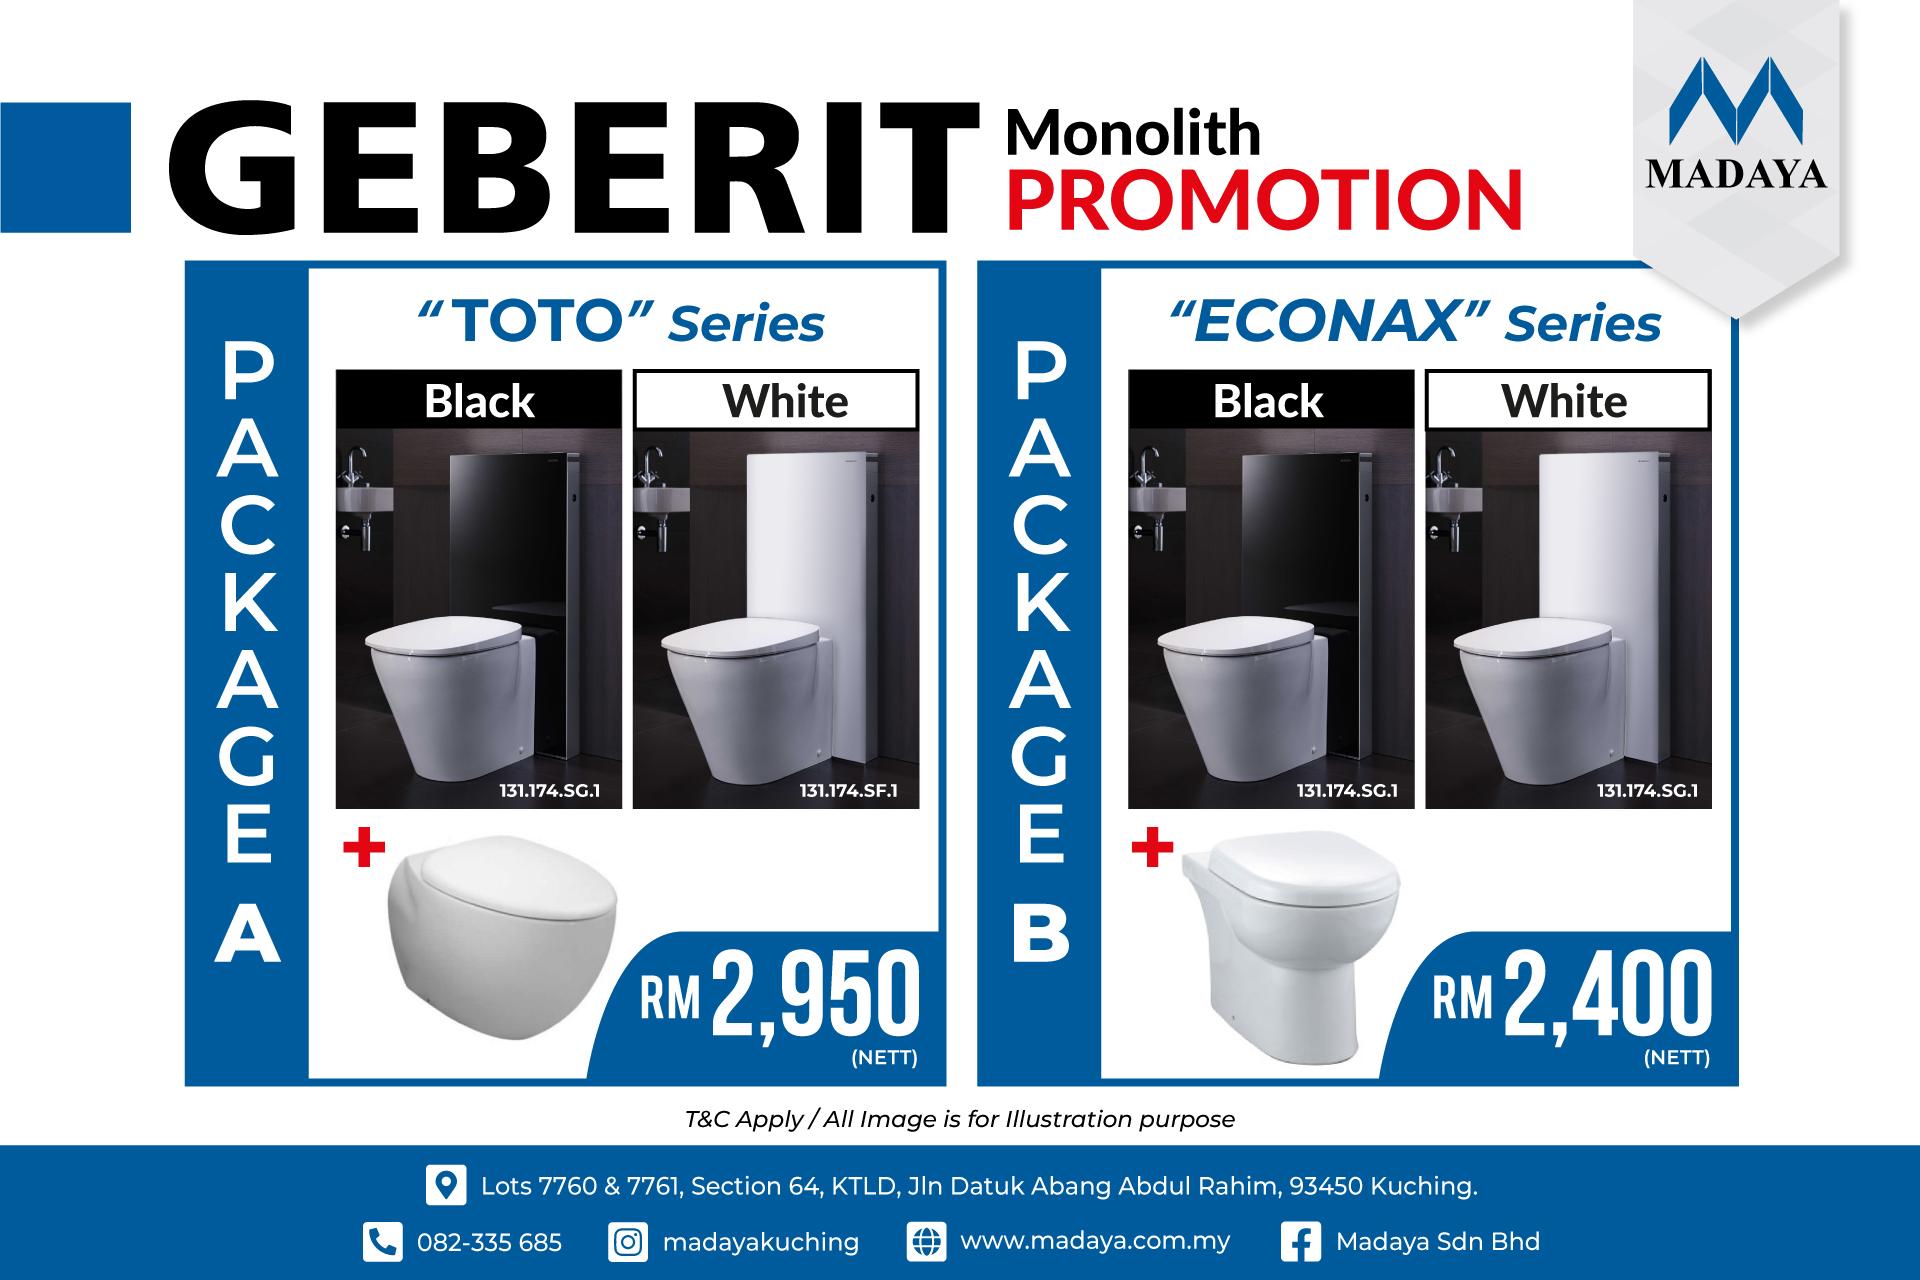 Geberit Monolith Savings Promotion